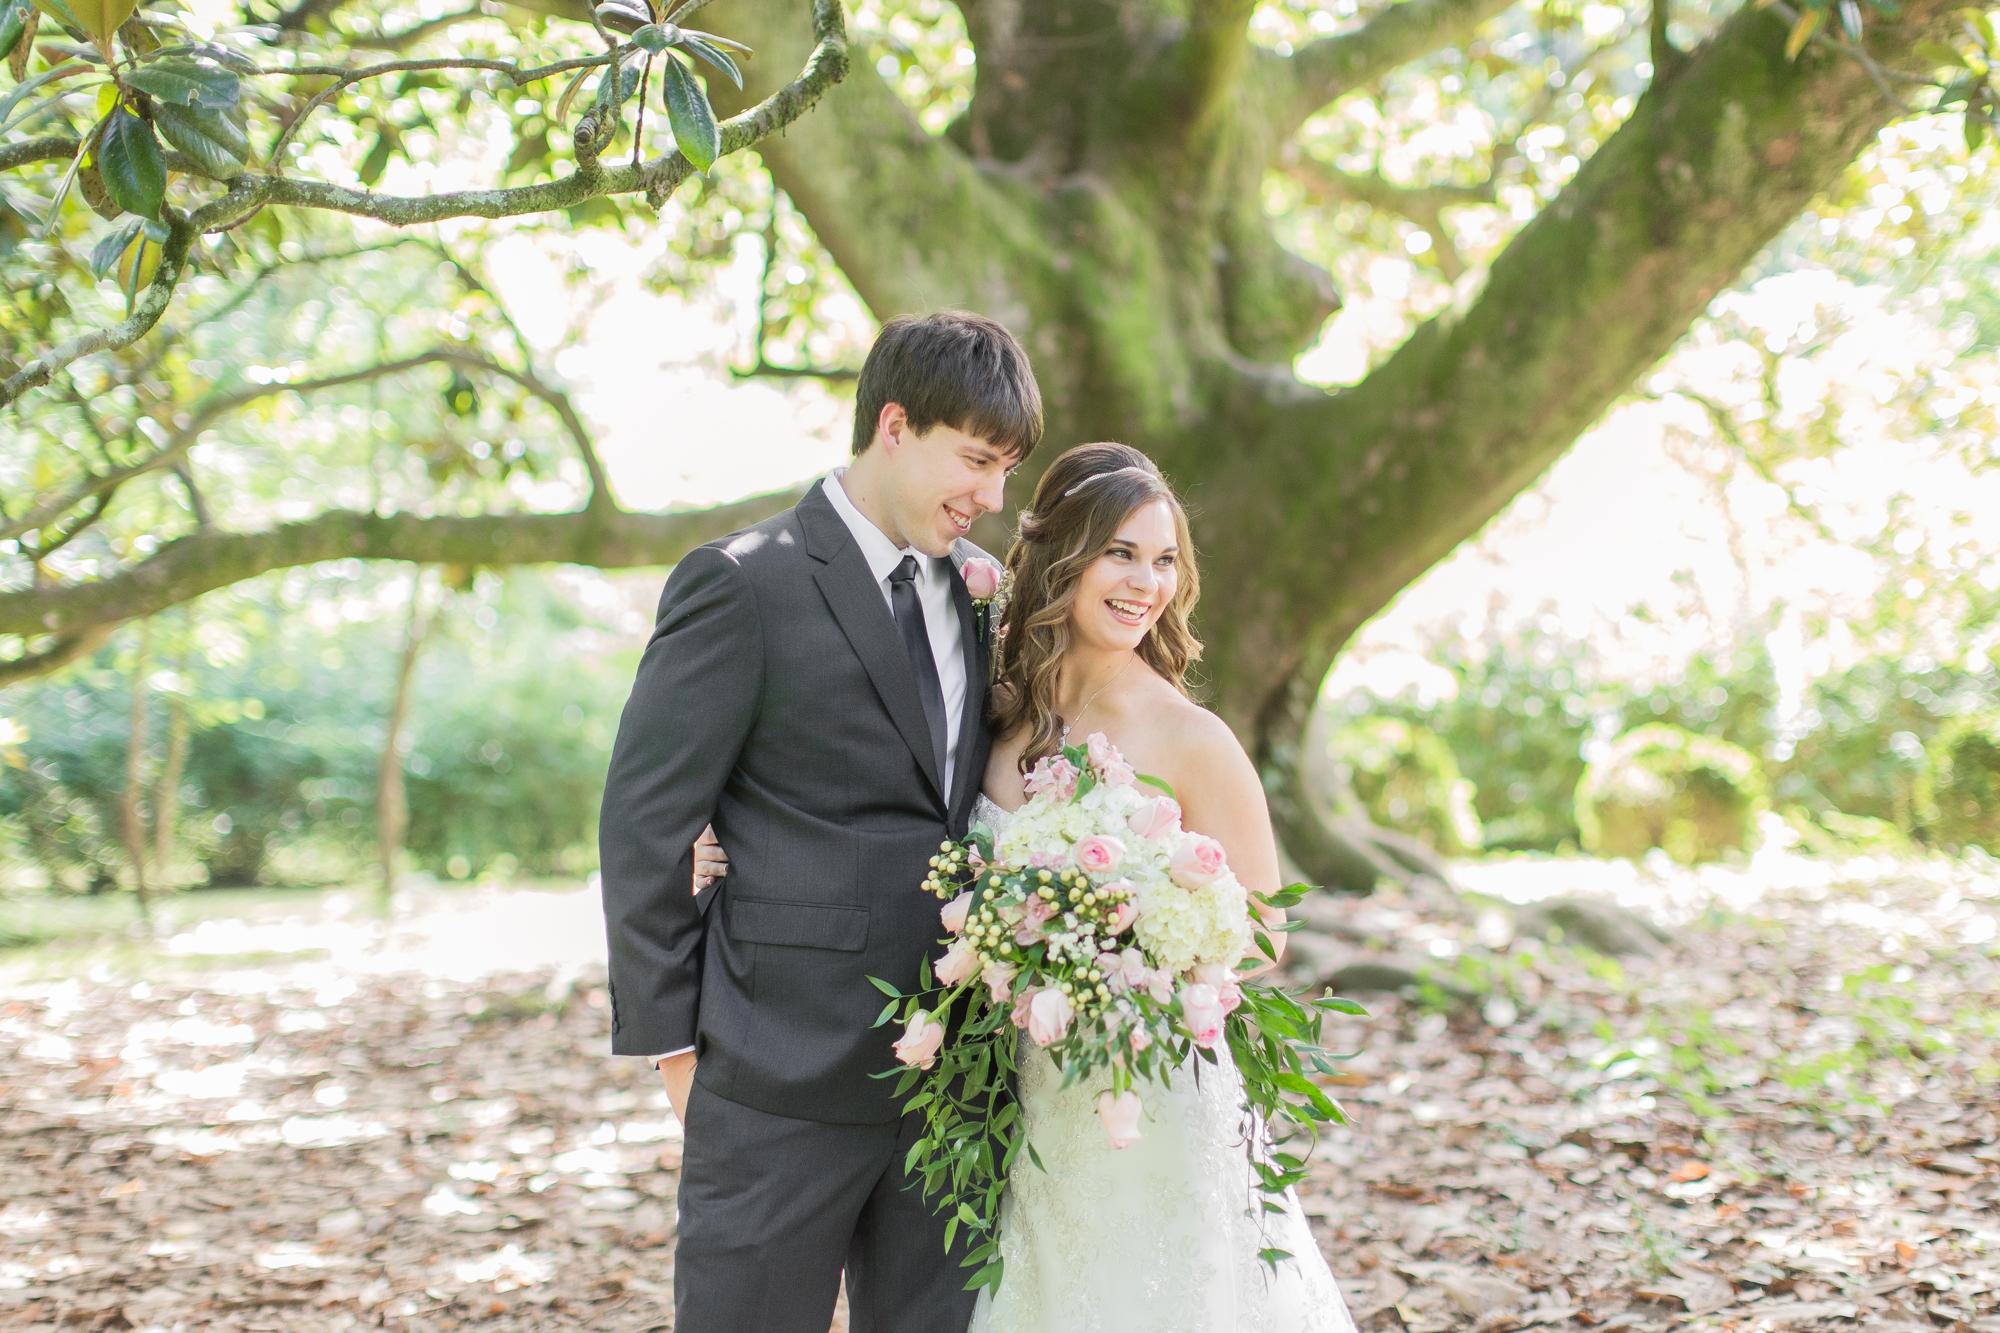 hendersonwedding-153.jpg